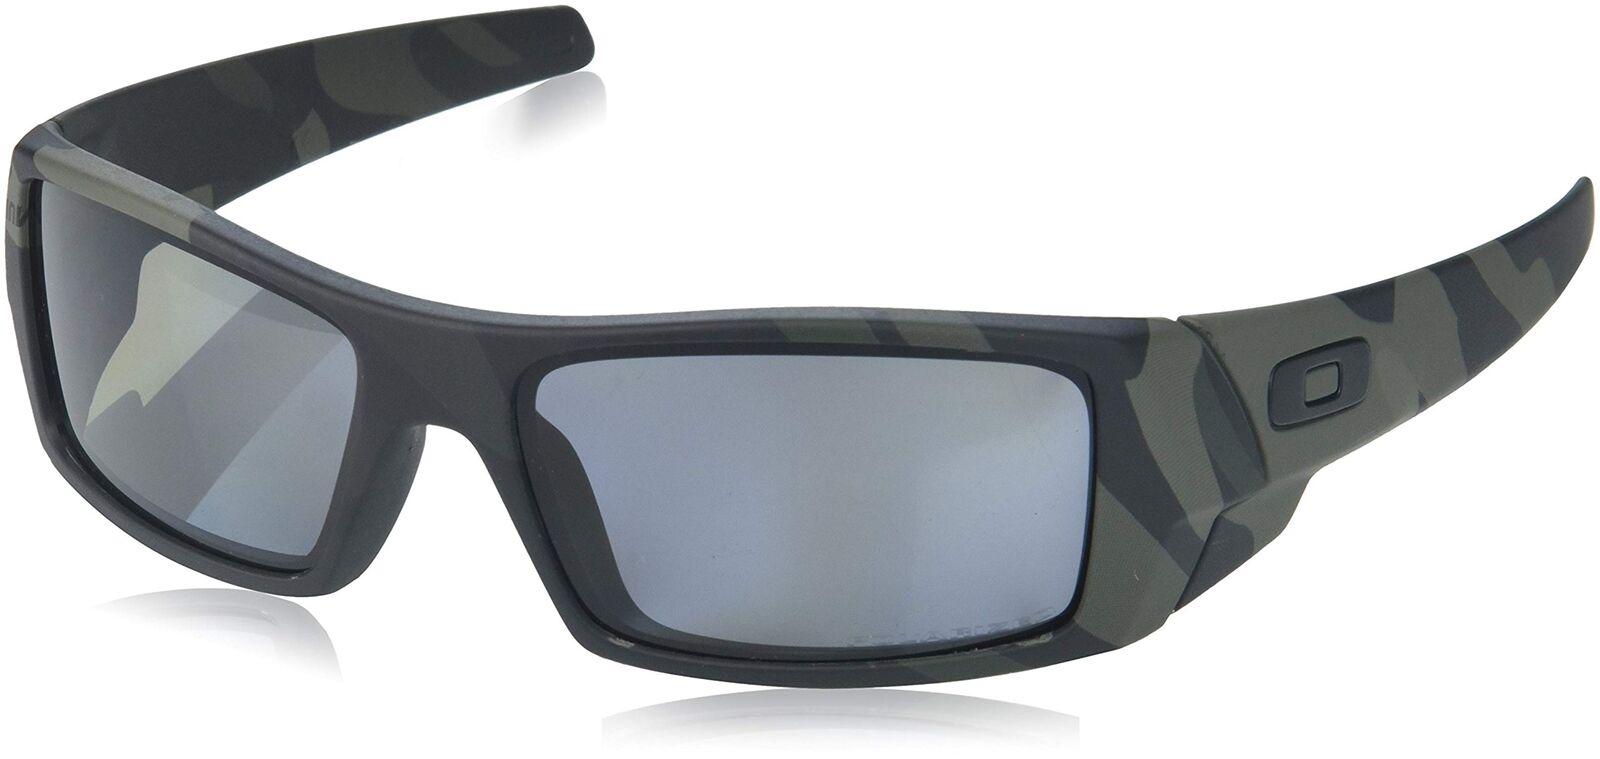 d881d14a11 Oakley Gascan OO9014 03 Multicam Black/Gray Polarized Sunglasses 9014 03